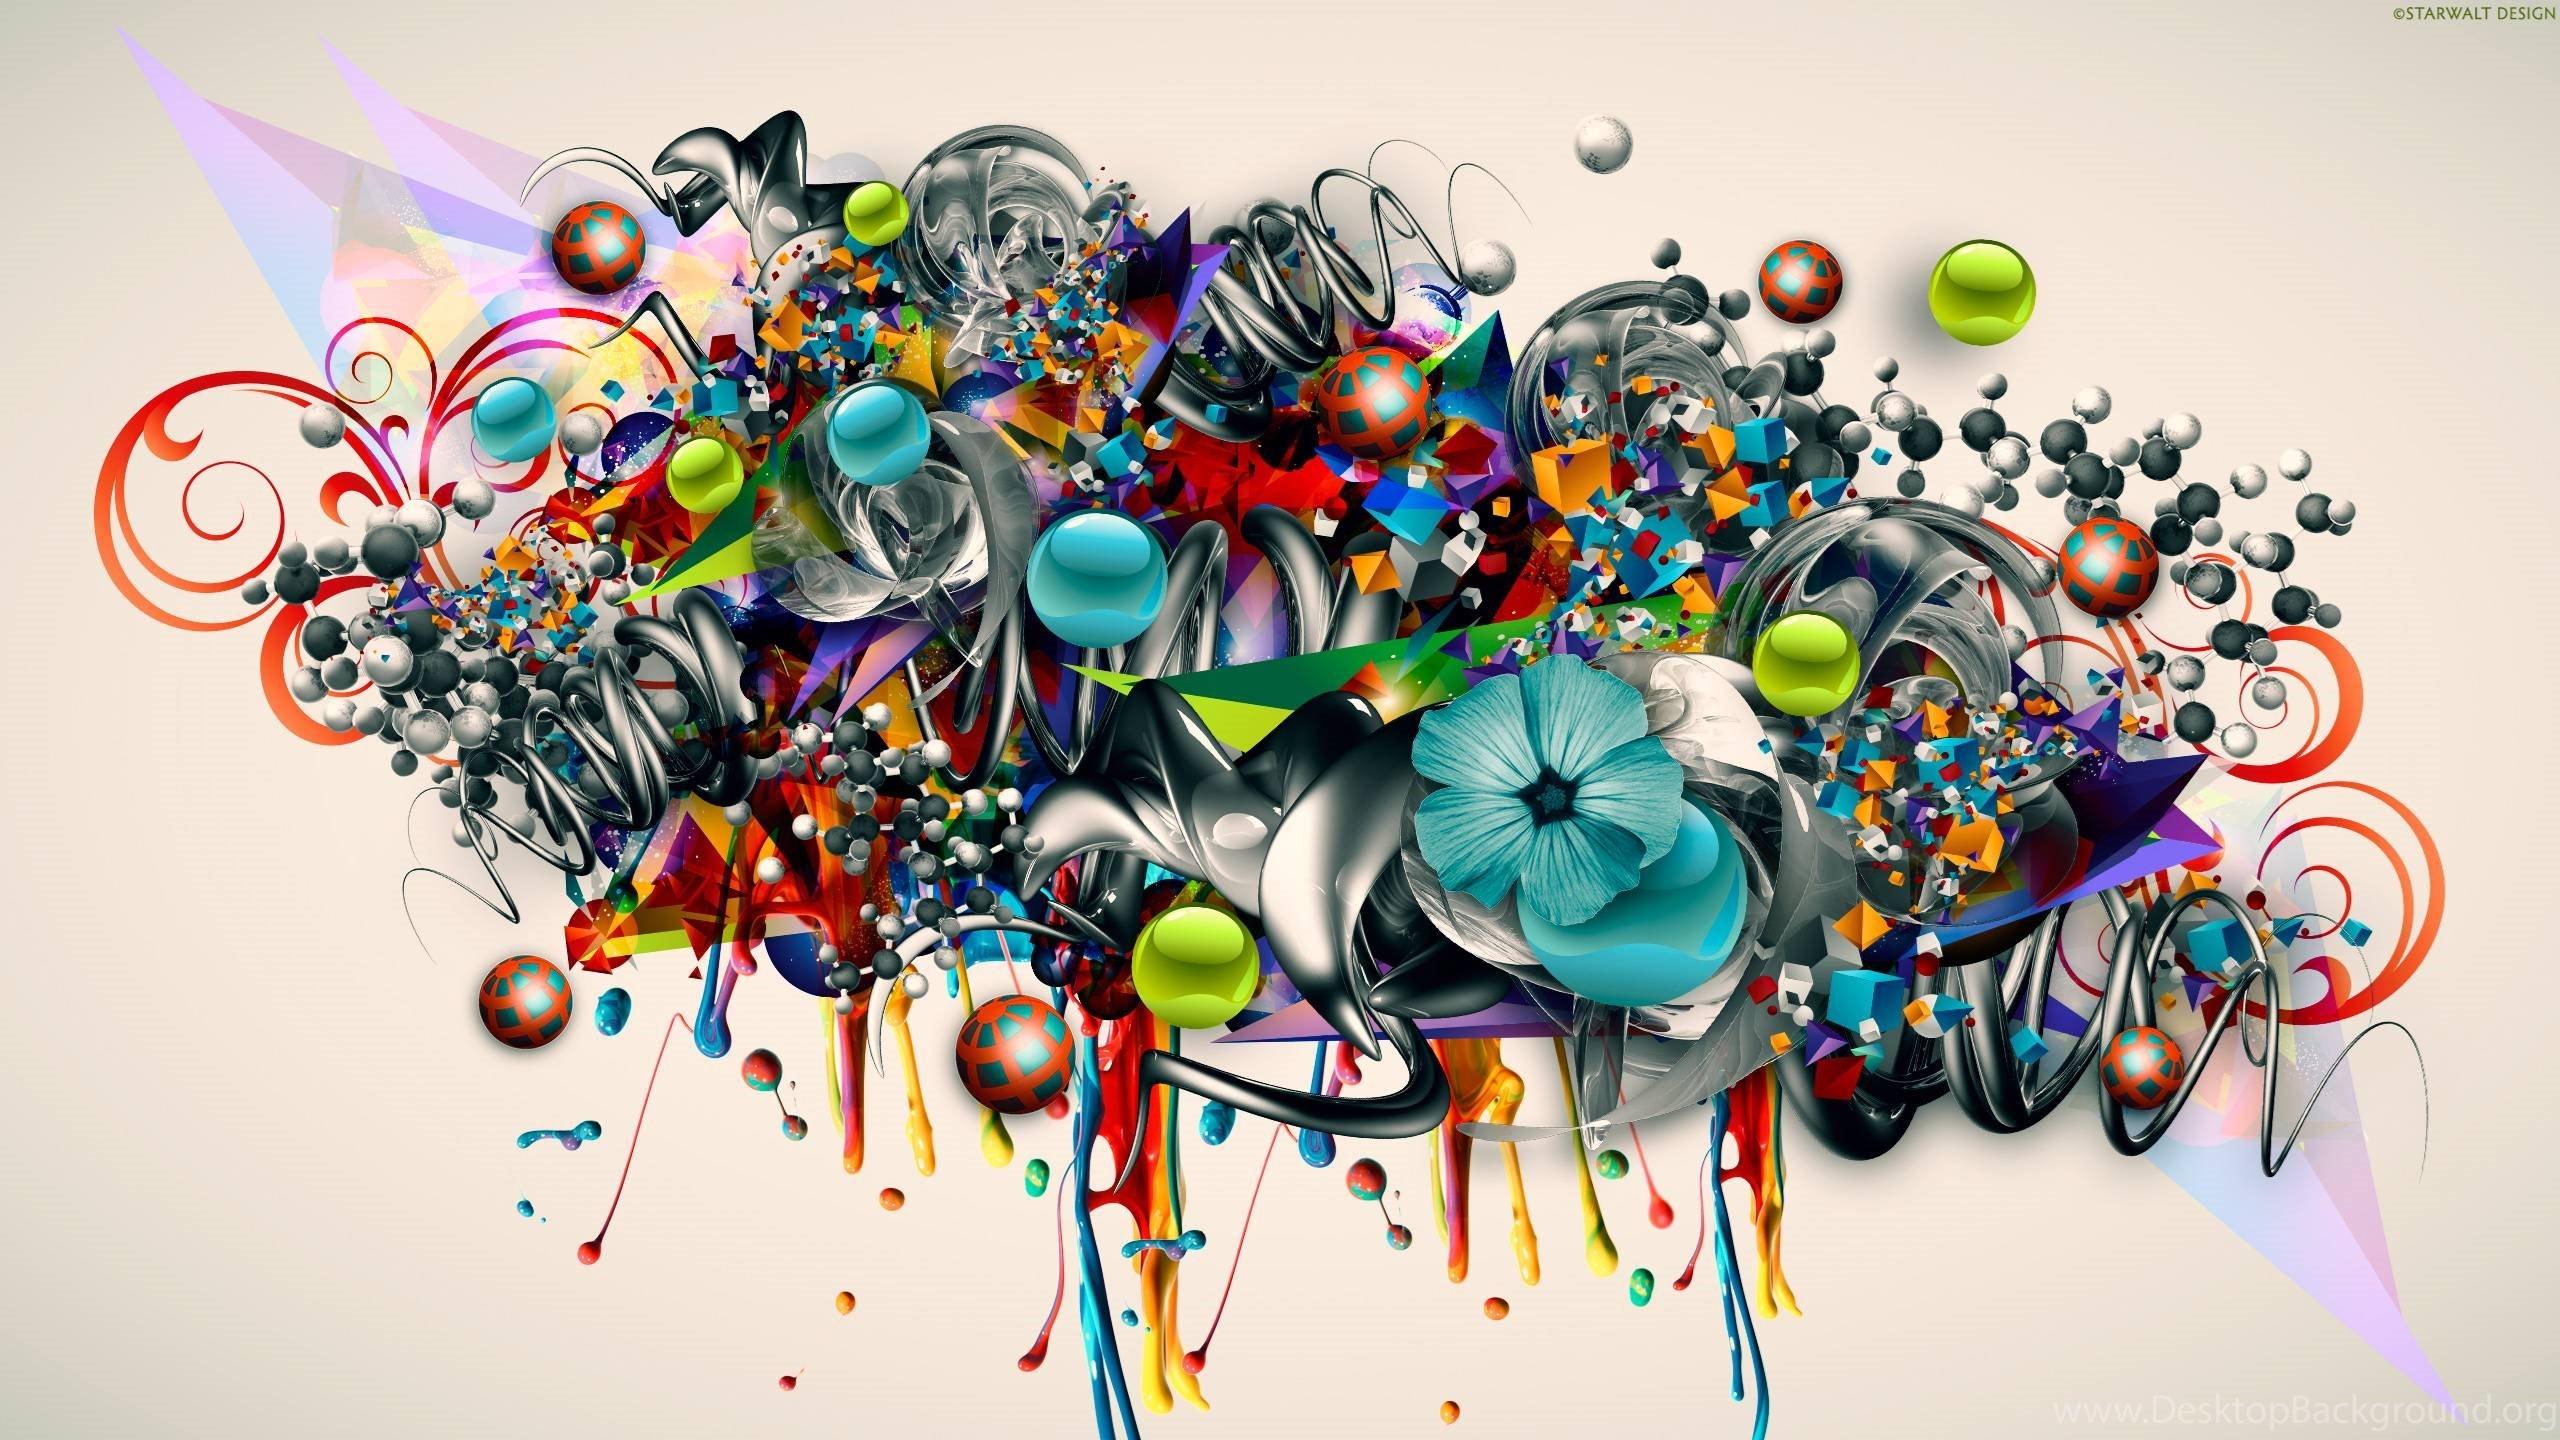 289 Graffiti Hd Wallpapers Desktop Background